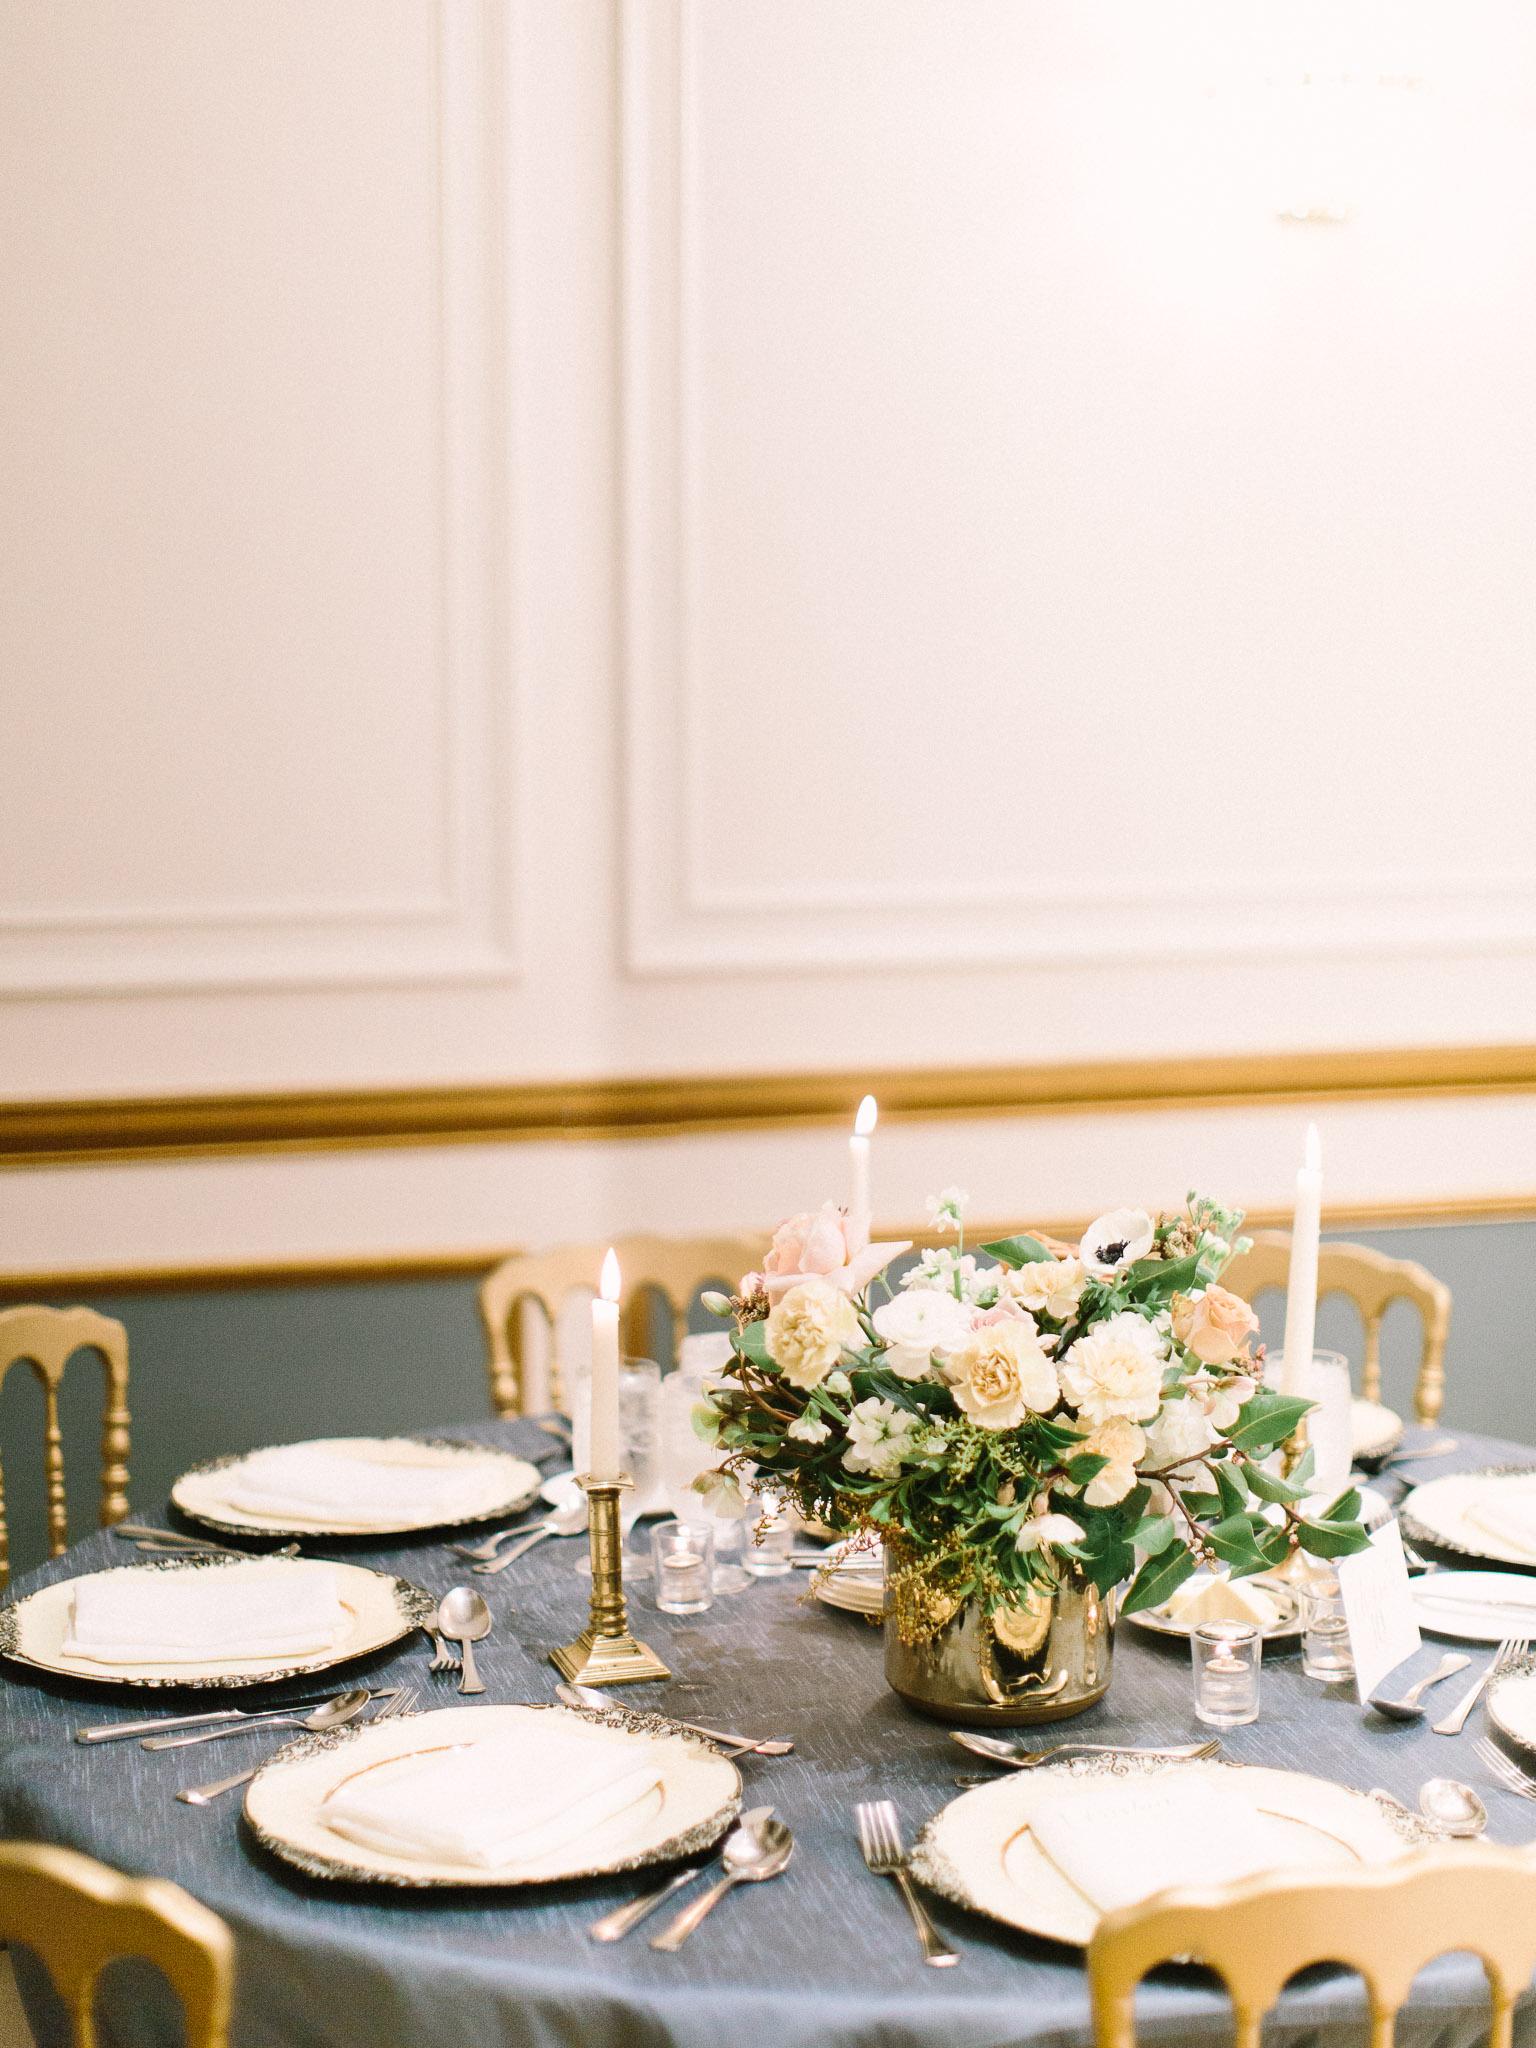 Hanna&Jordan Wedding_HotelVancouver_9495.jpg